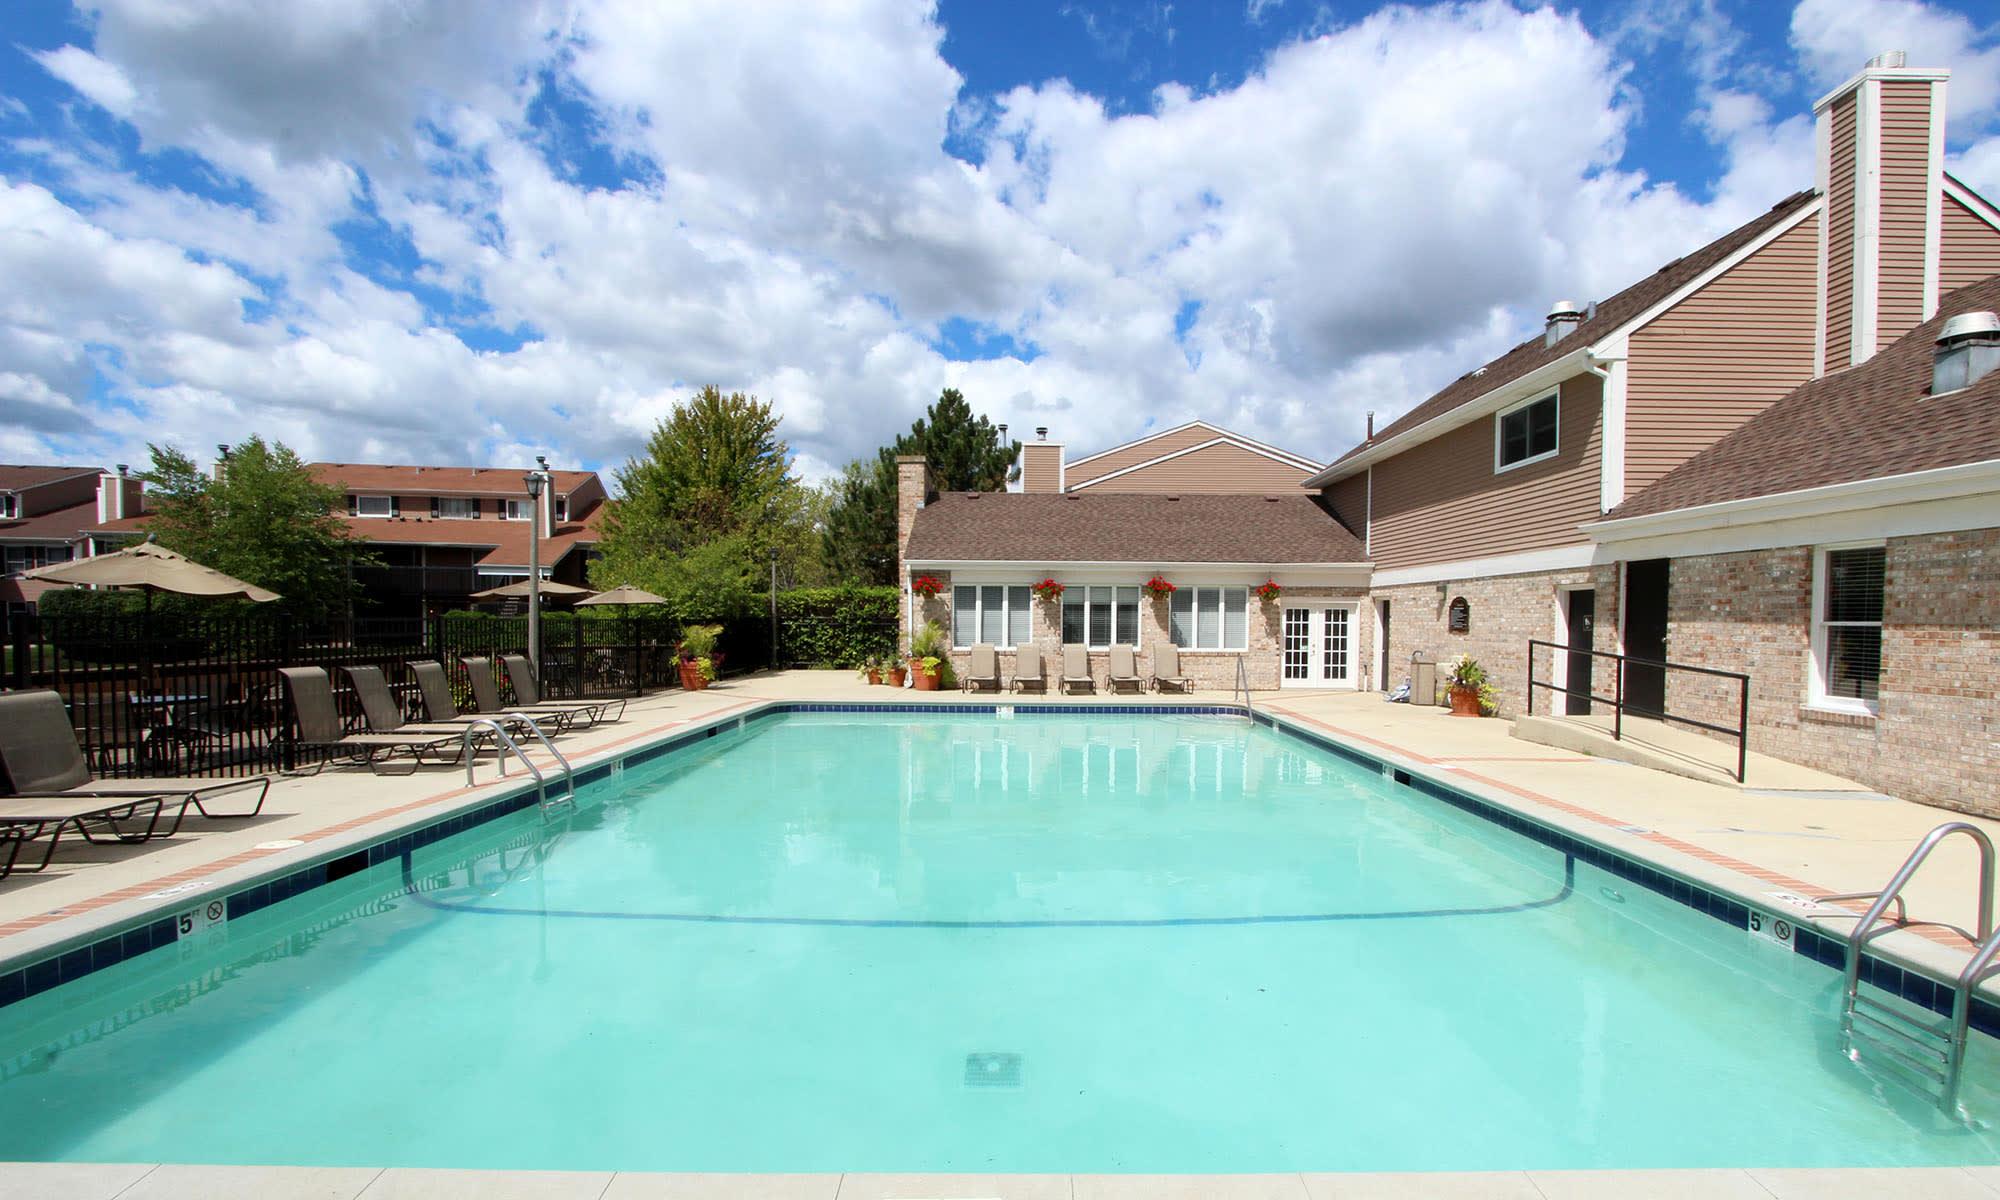 Aurora, IL Apartments & Townhomes for Rent | Aspen Place